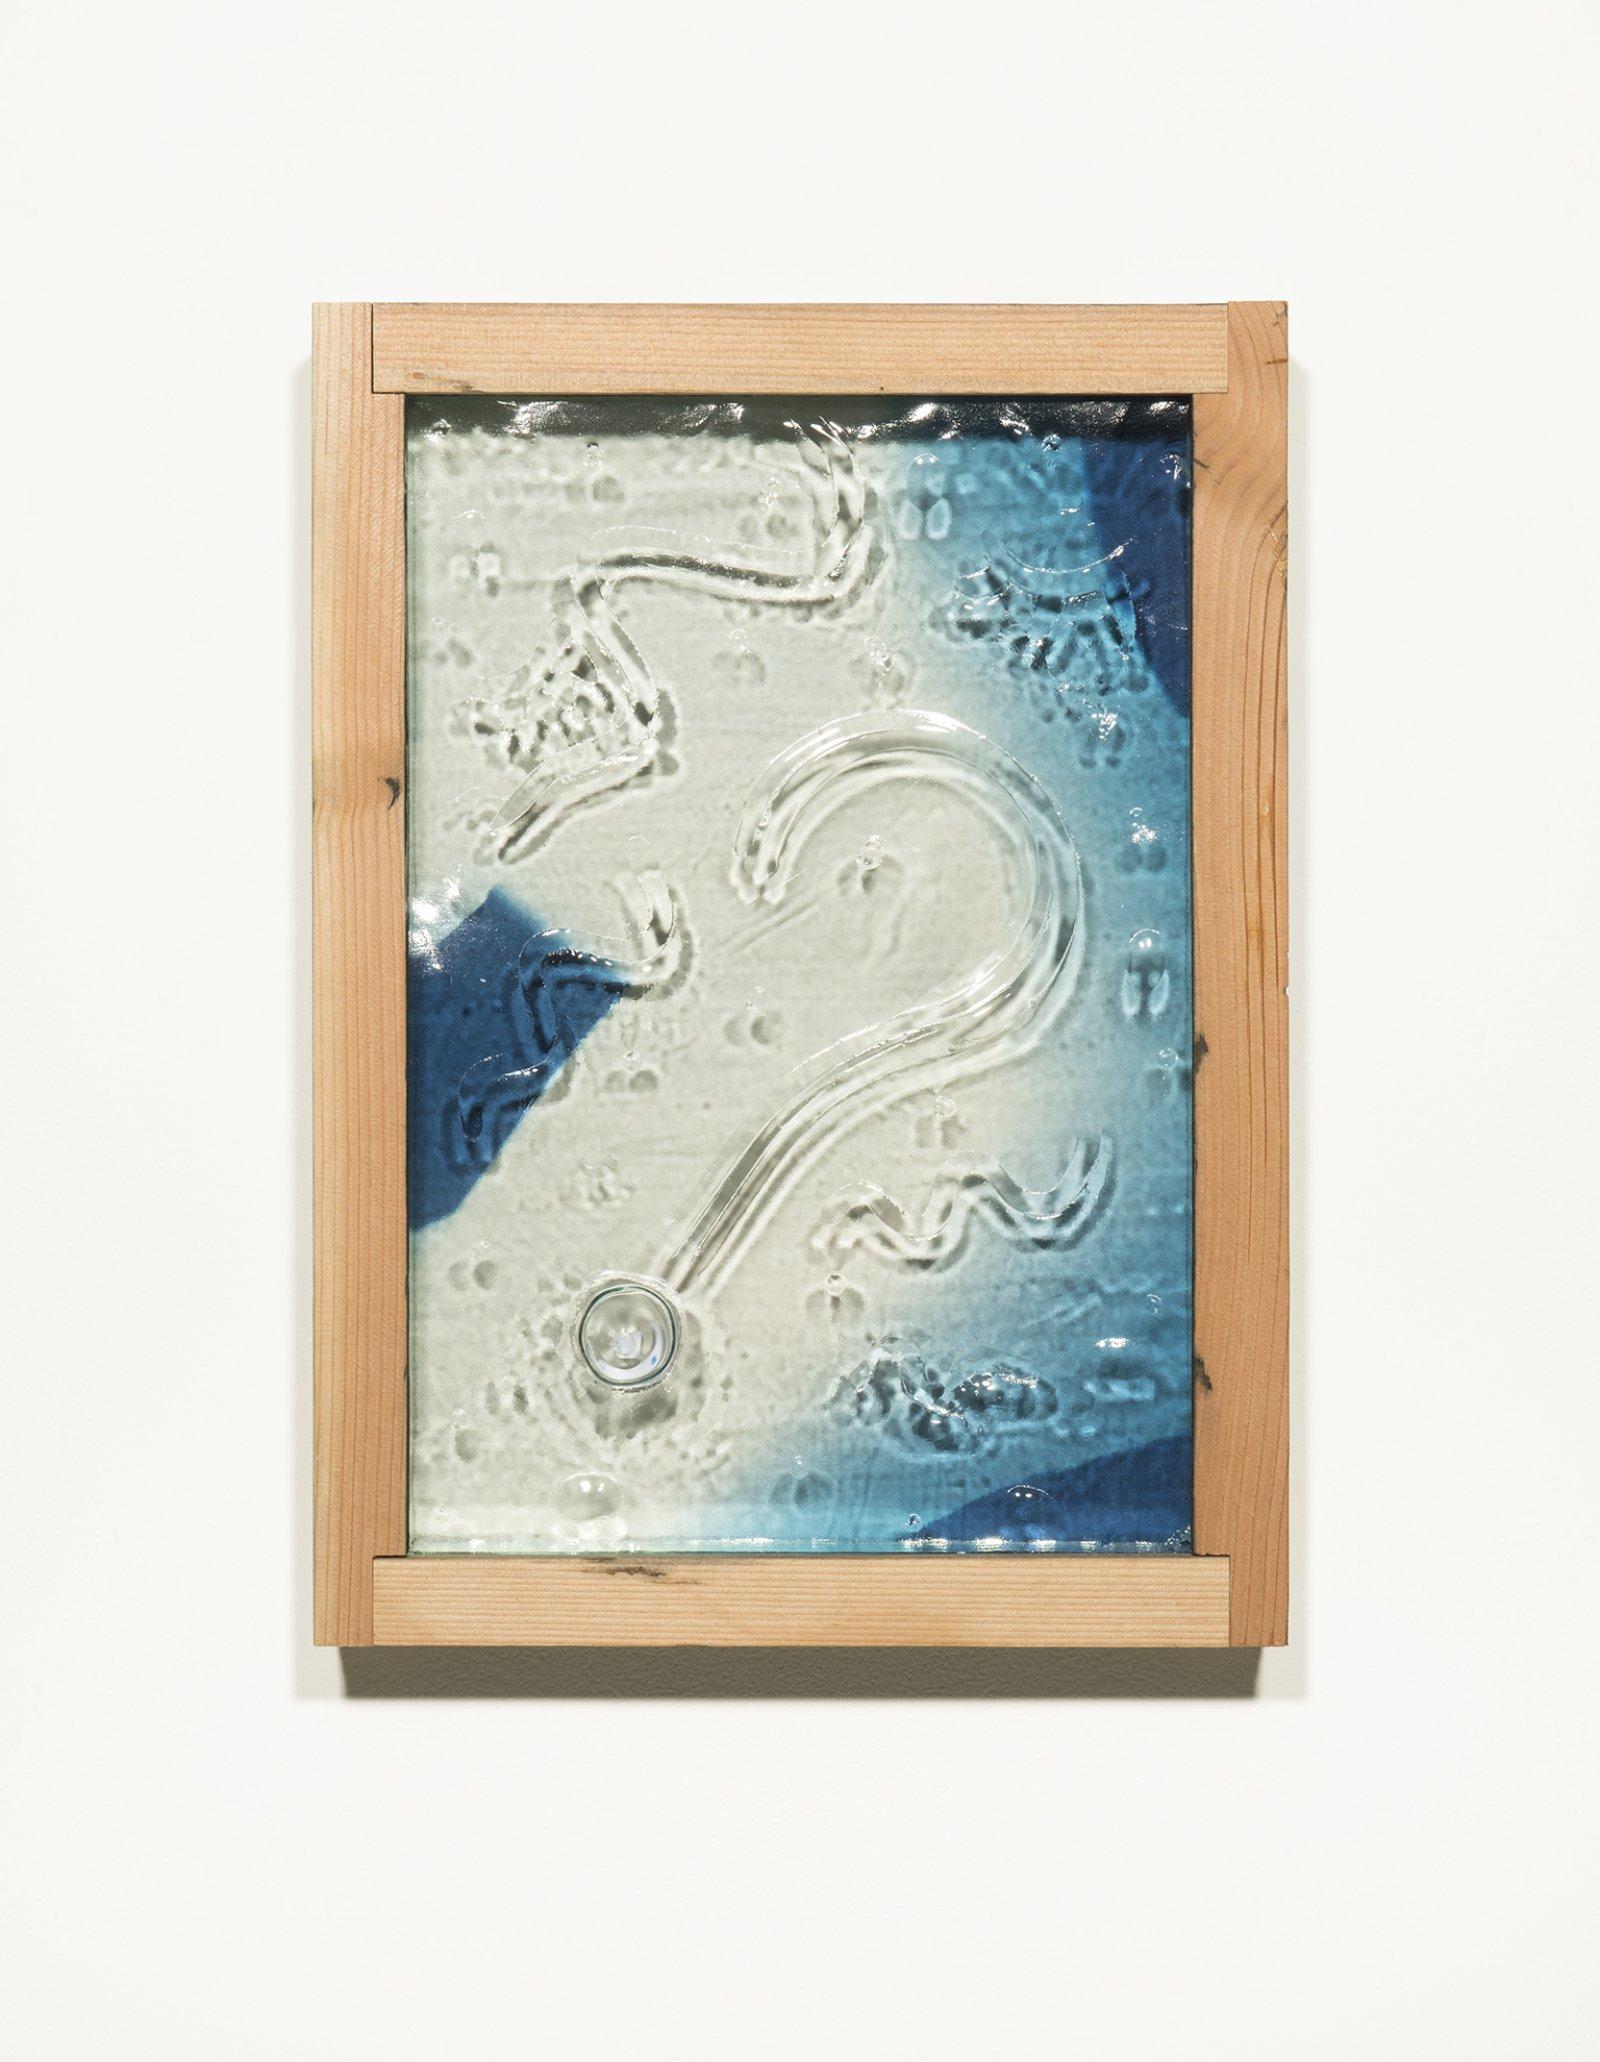 Julia Feyrer,The Pedestrians: Left Head, Right Head, Left Body, Right Body, Left Foot, Right Foot, 2014, 6 cyanotypes, dice, aged fir, mirror inlay, each 22 x 16 x 3 inches (56 x 41 x 8 cm)